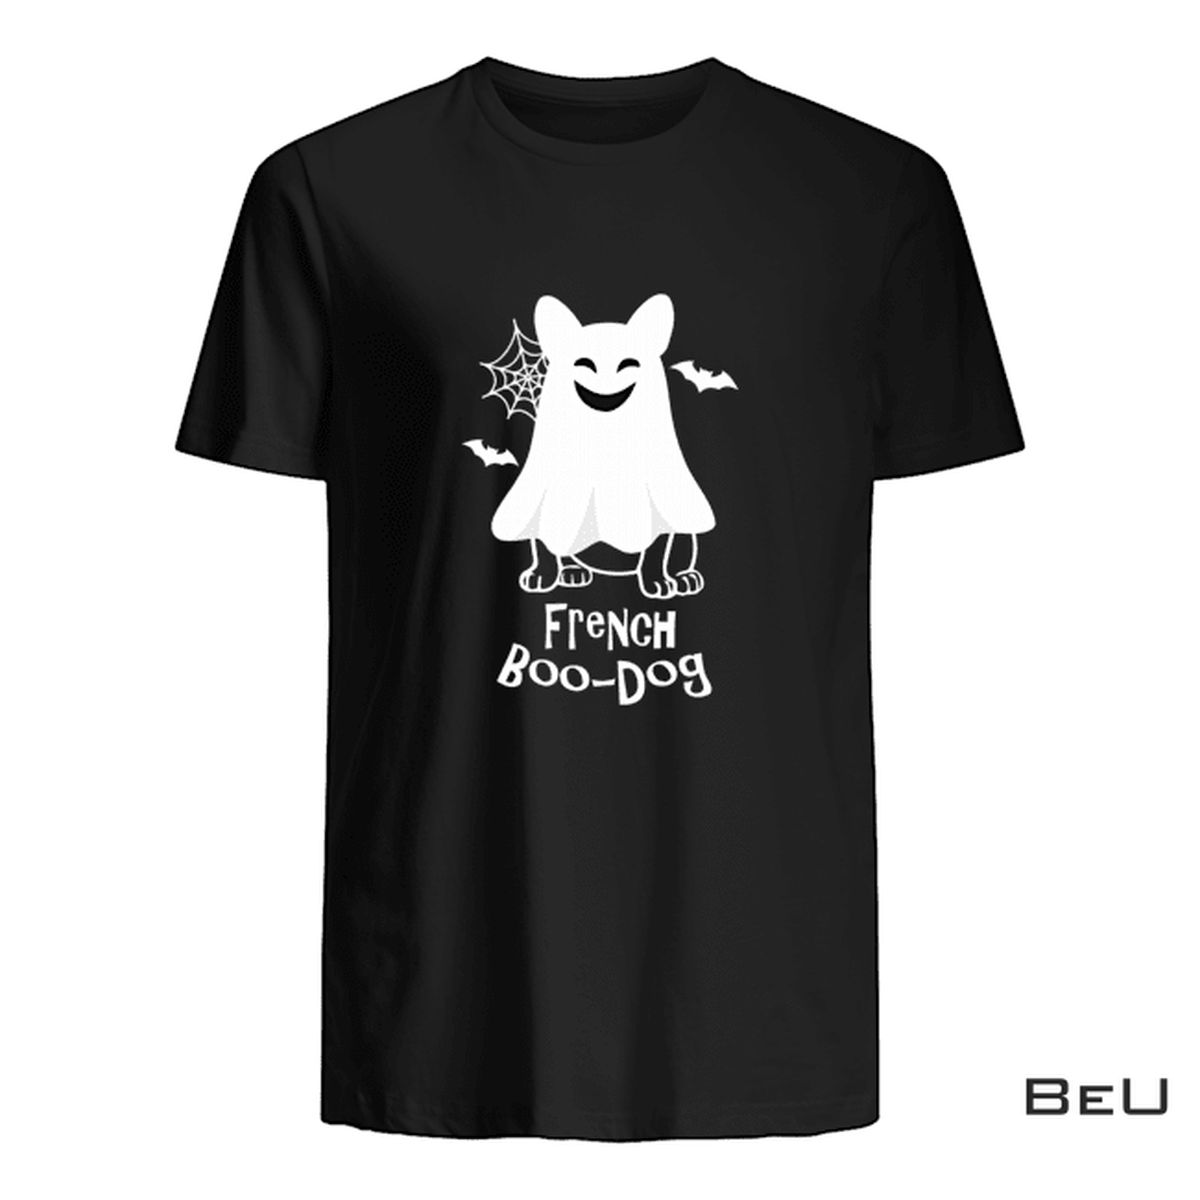 French Boo-dog Halloween Shirt